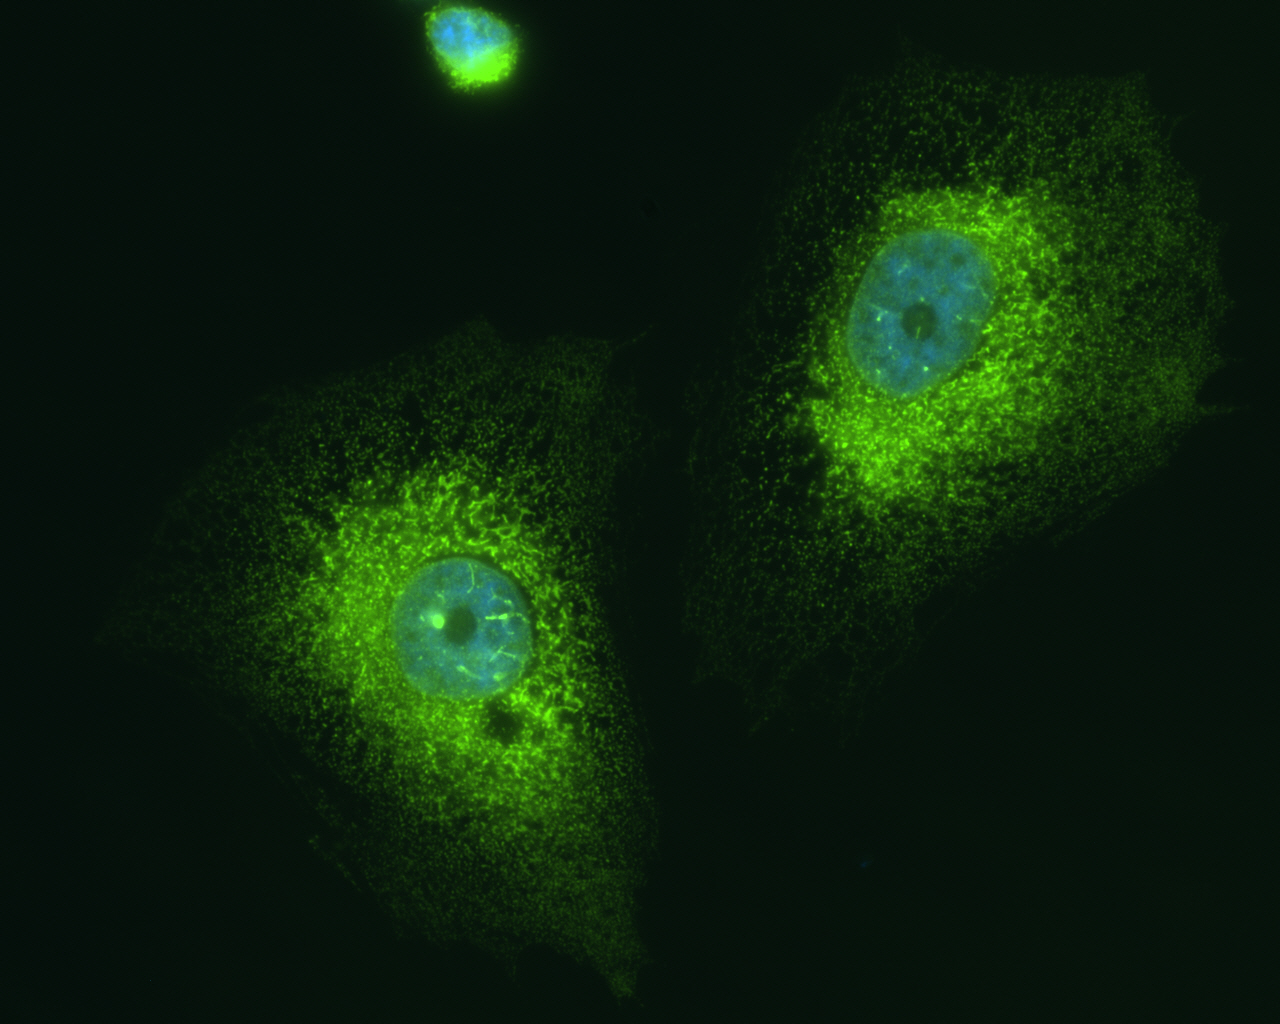 binding immunoglobulin protein 78